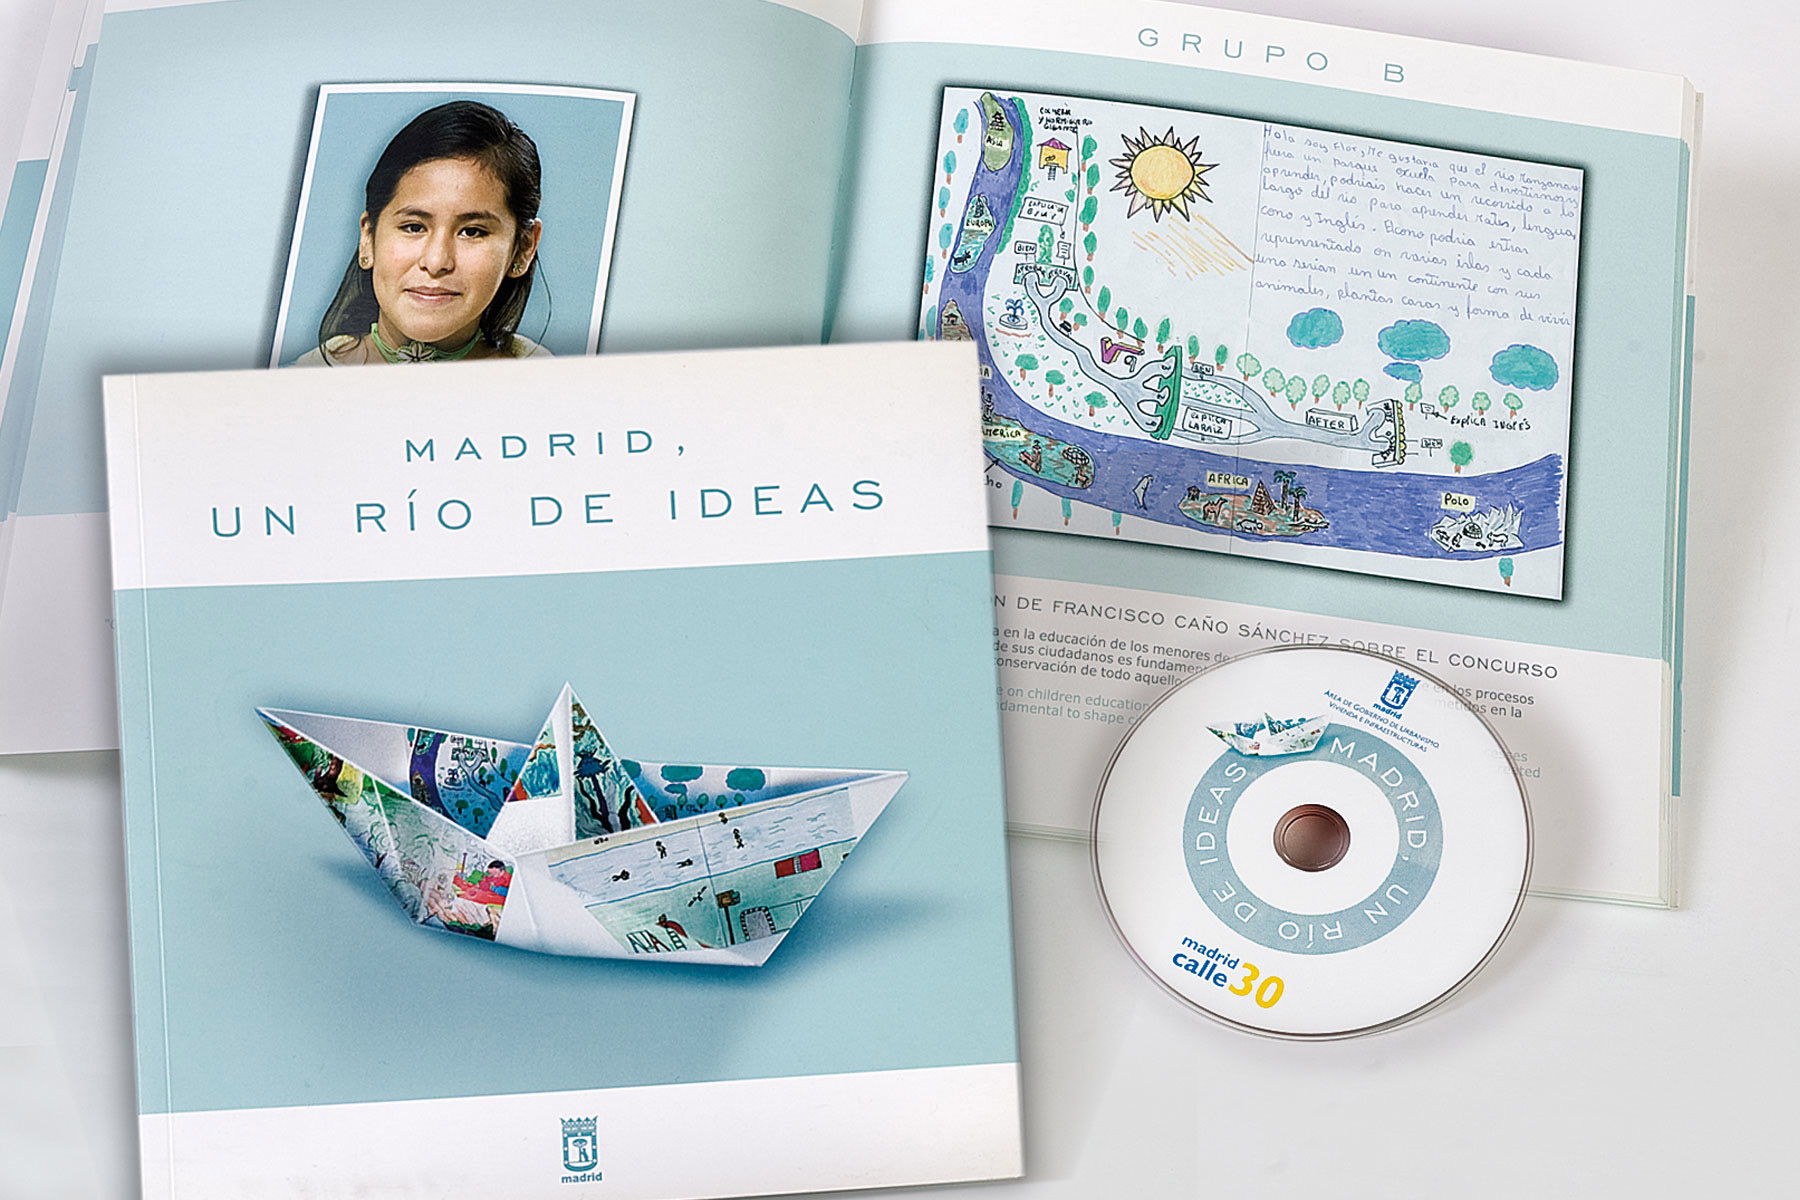 Libro-Madrid-Rio